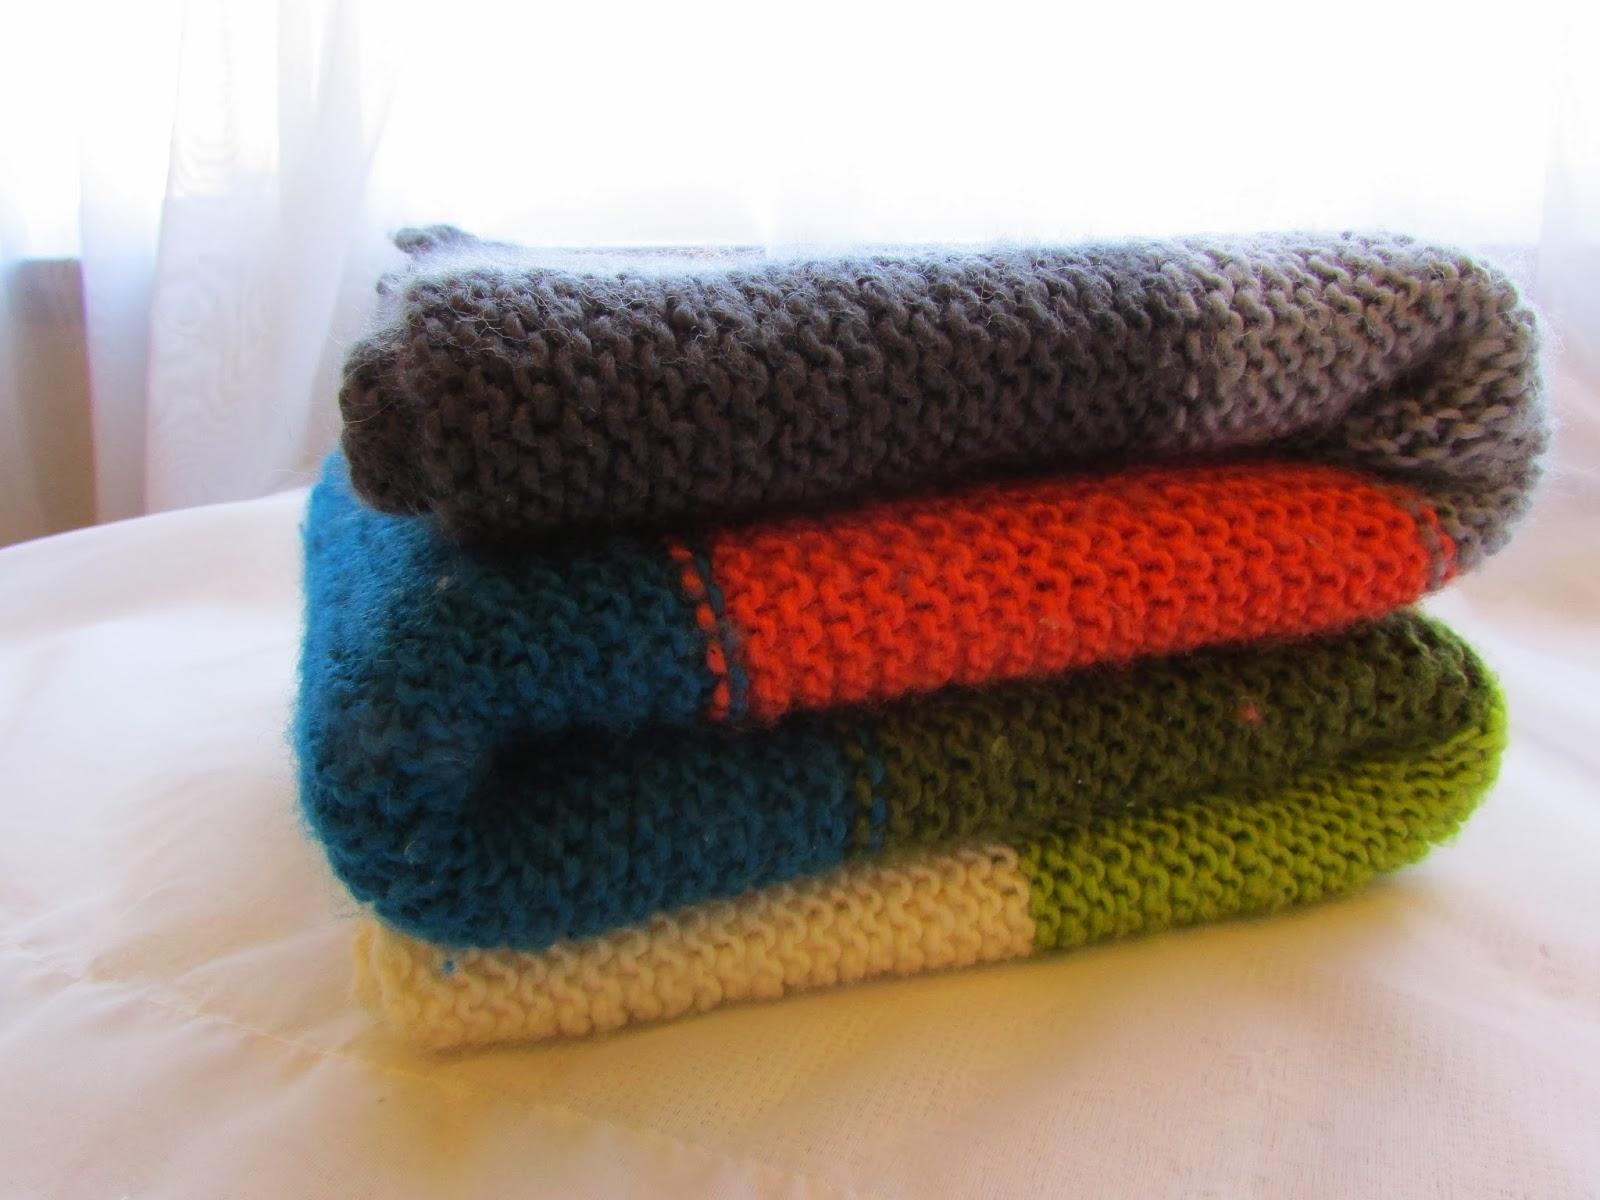 Ktog Knitting : A lively hope knit together